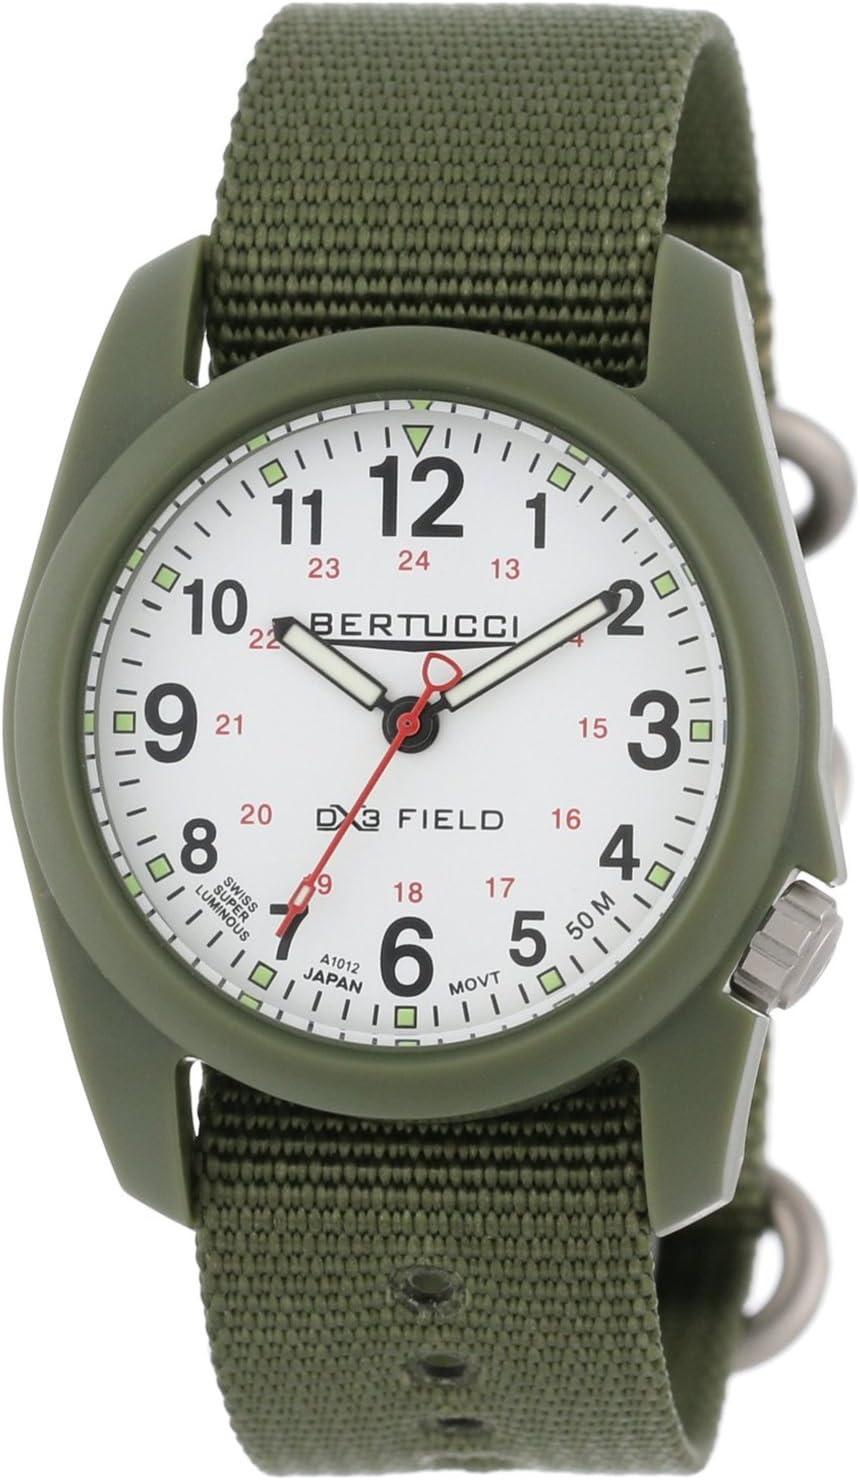 Bertucci DX3 Field Watch | White/Forest